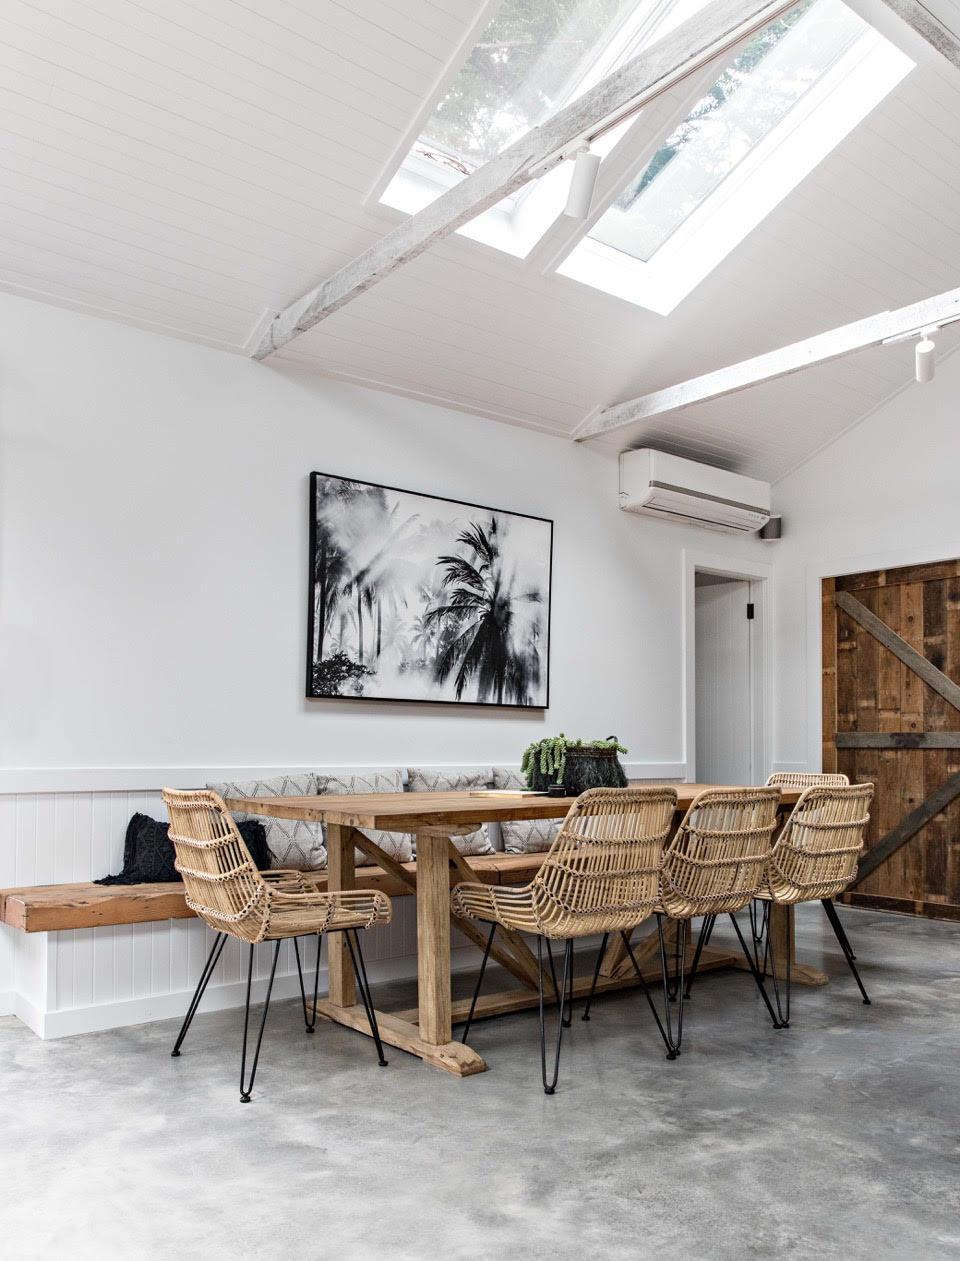 INTERIOR | Skylights & Concrete Floors